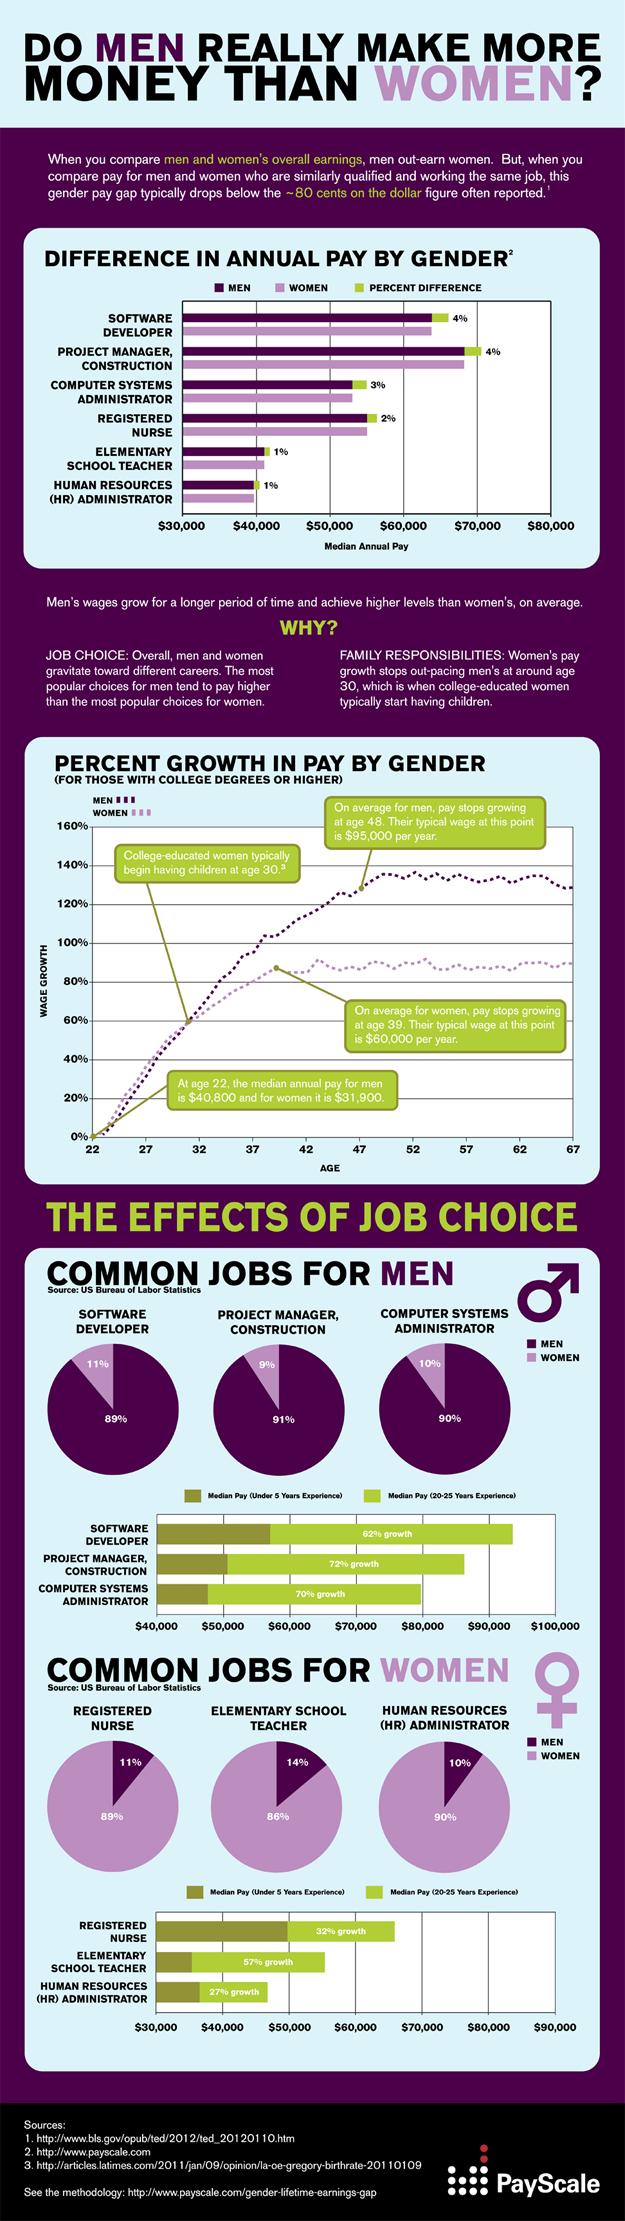 Do Men Really Earn More Than Women?